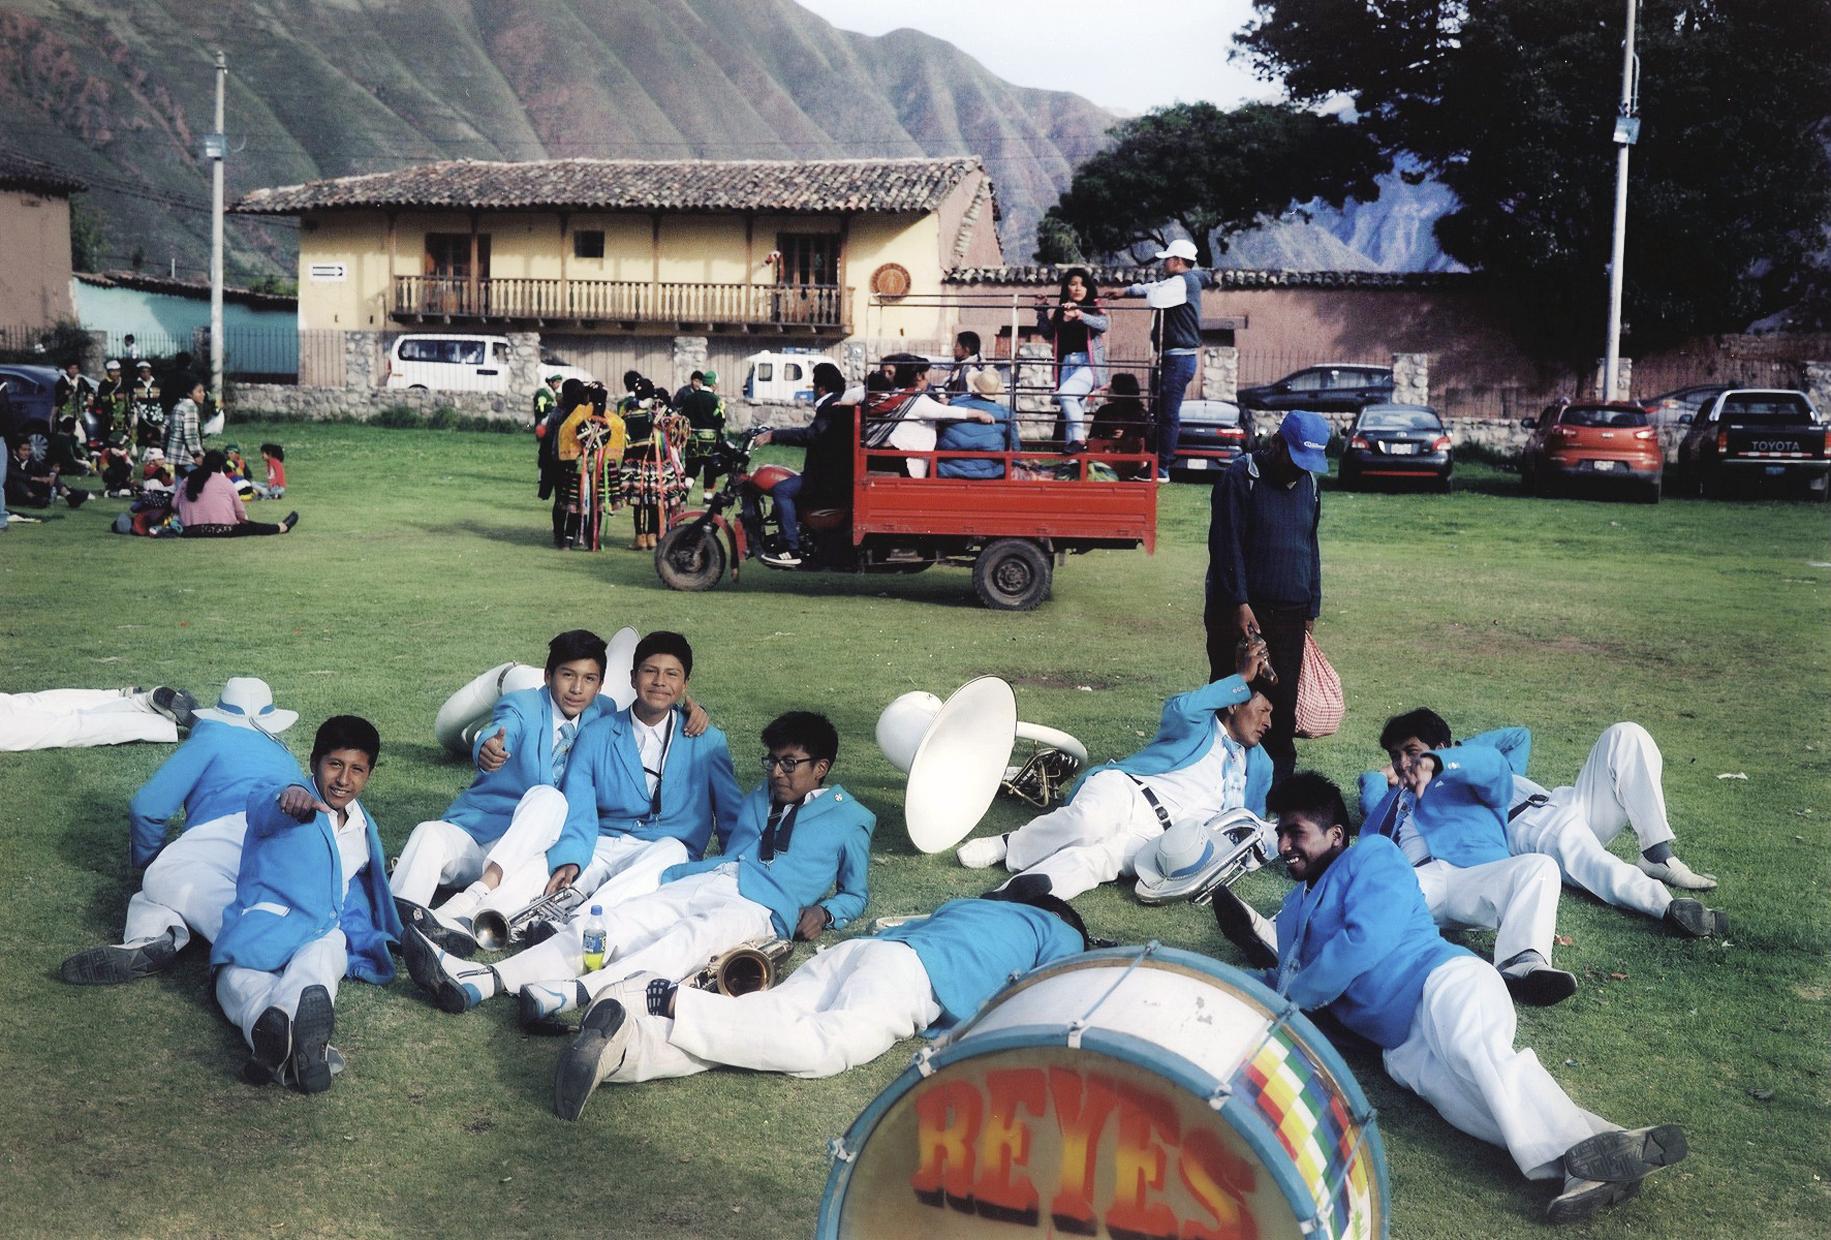 Fiesta at Urubamba, Peru